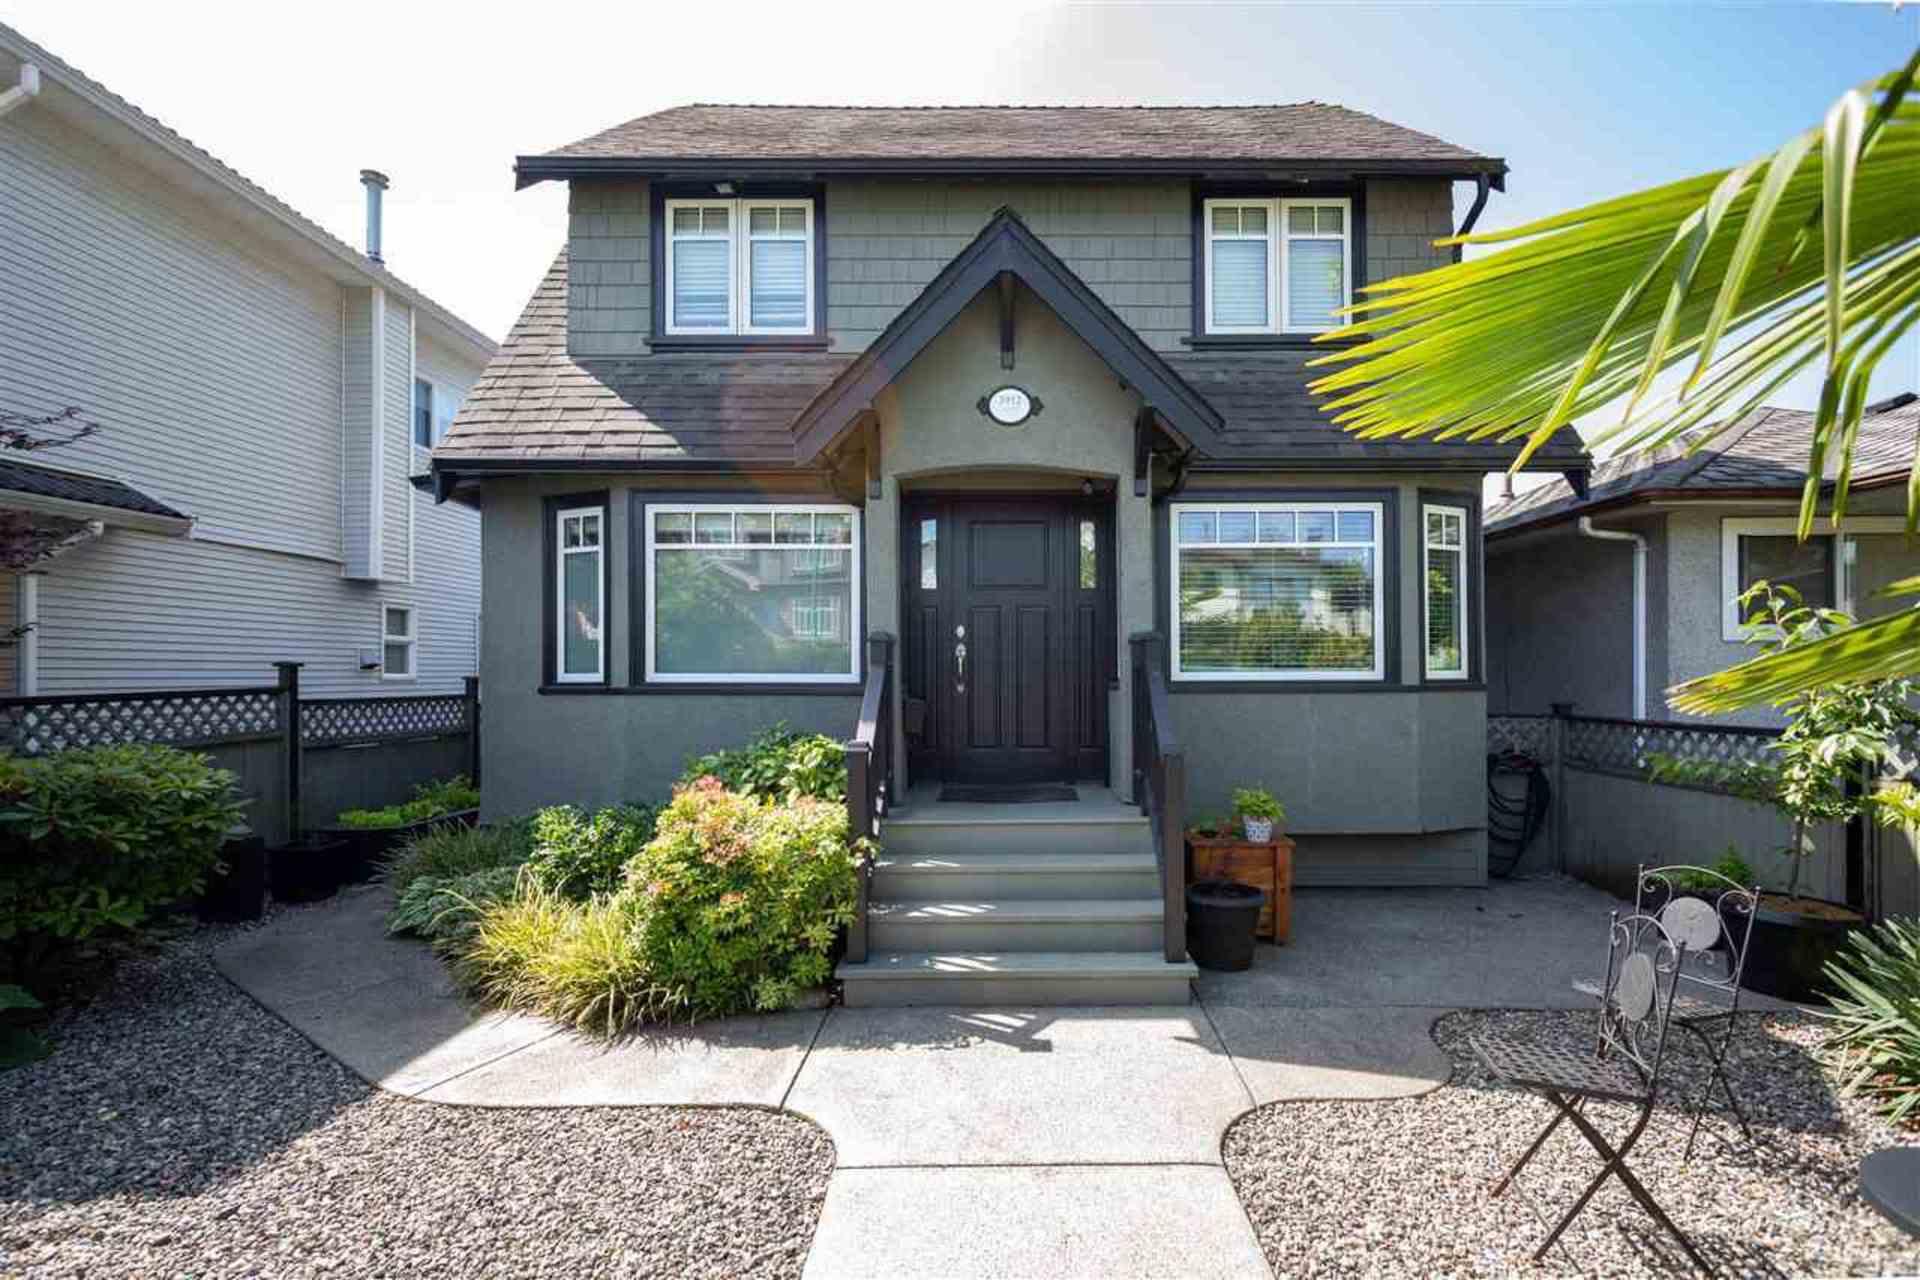 3912-parker-street-willingdon-heights-burnaby-north-03 at 3912 Parker Street, Willingdon Heights, Burnaby North